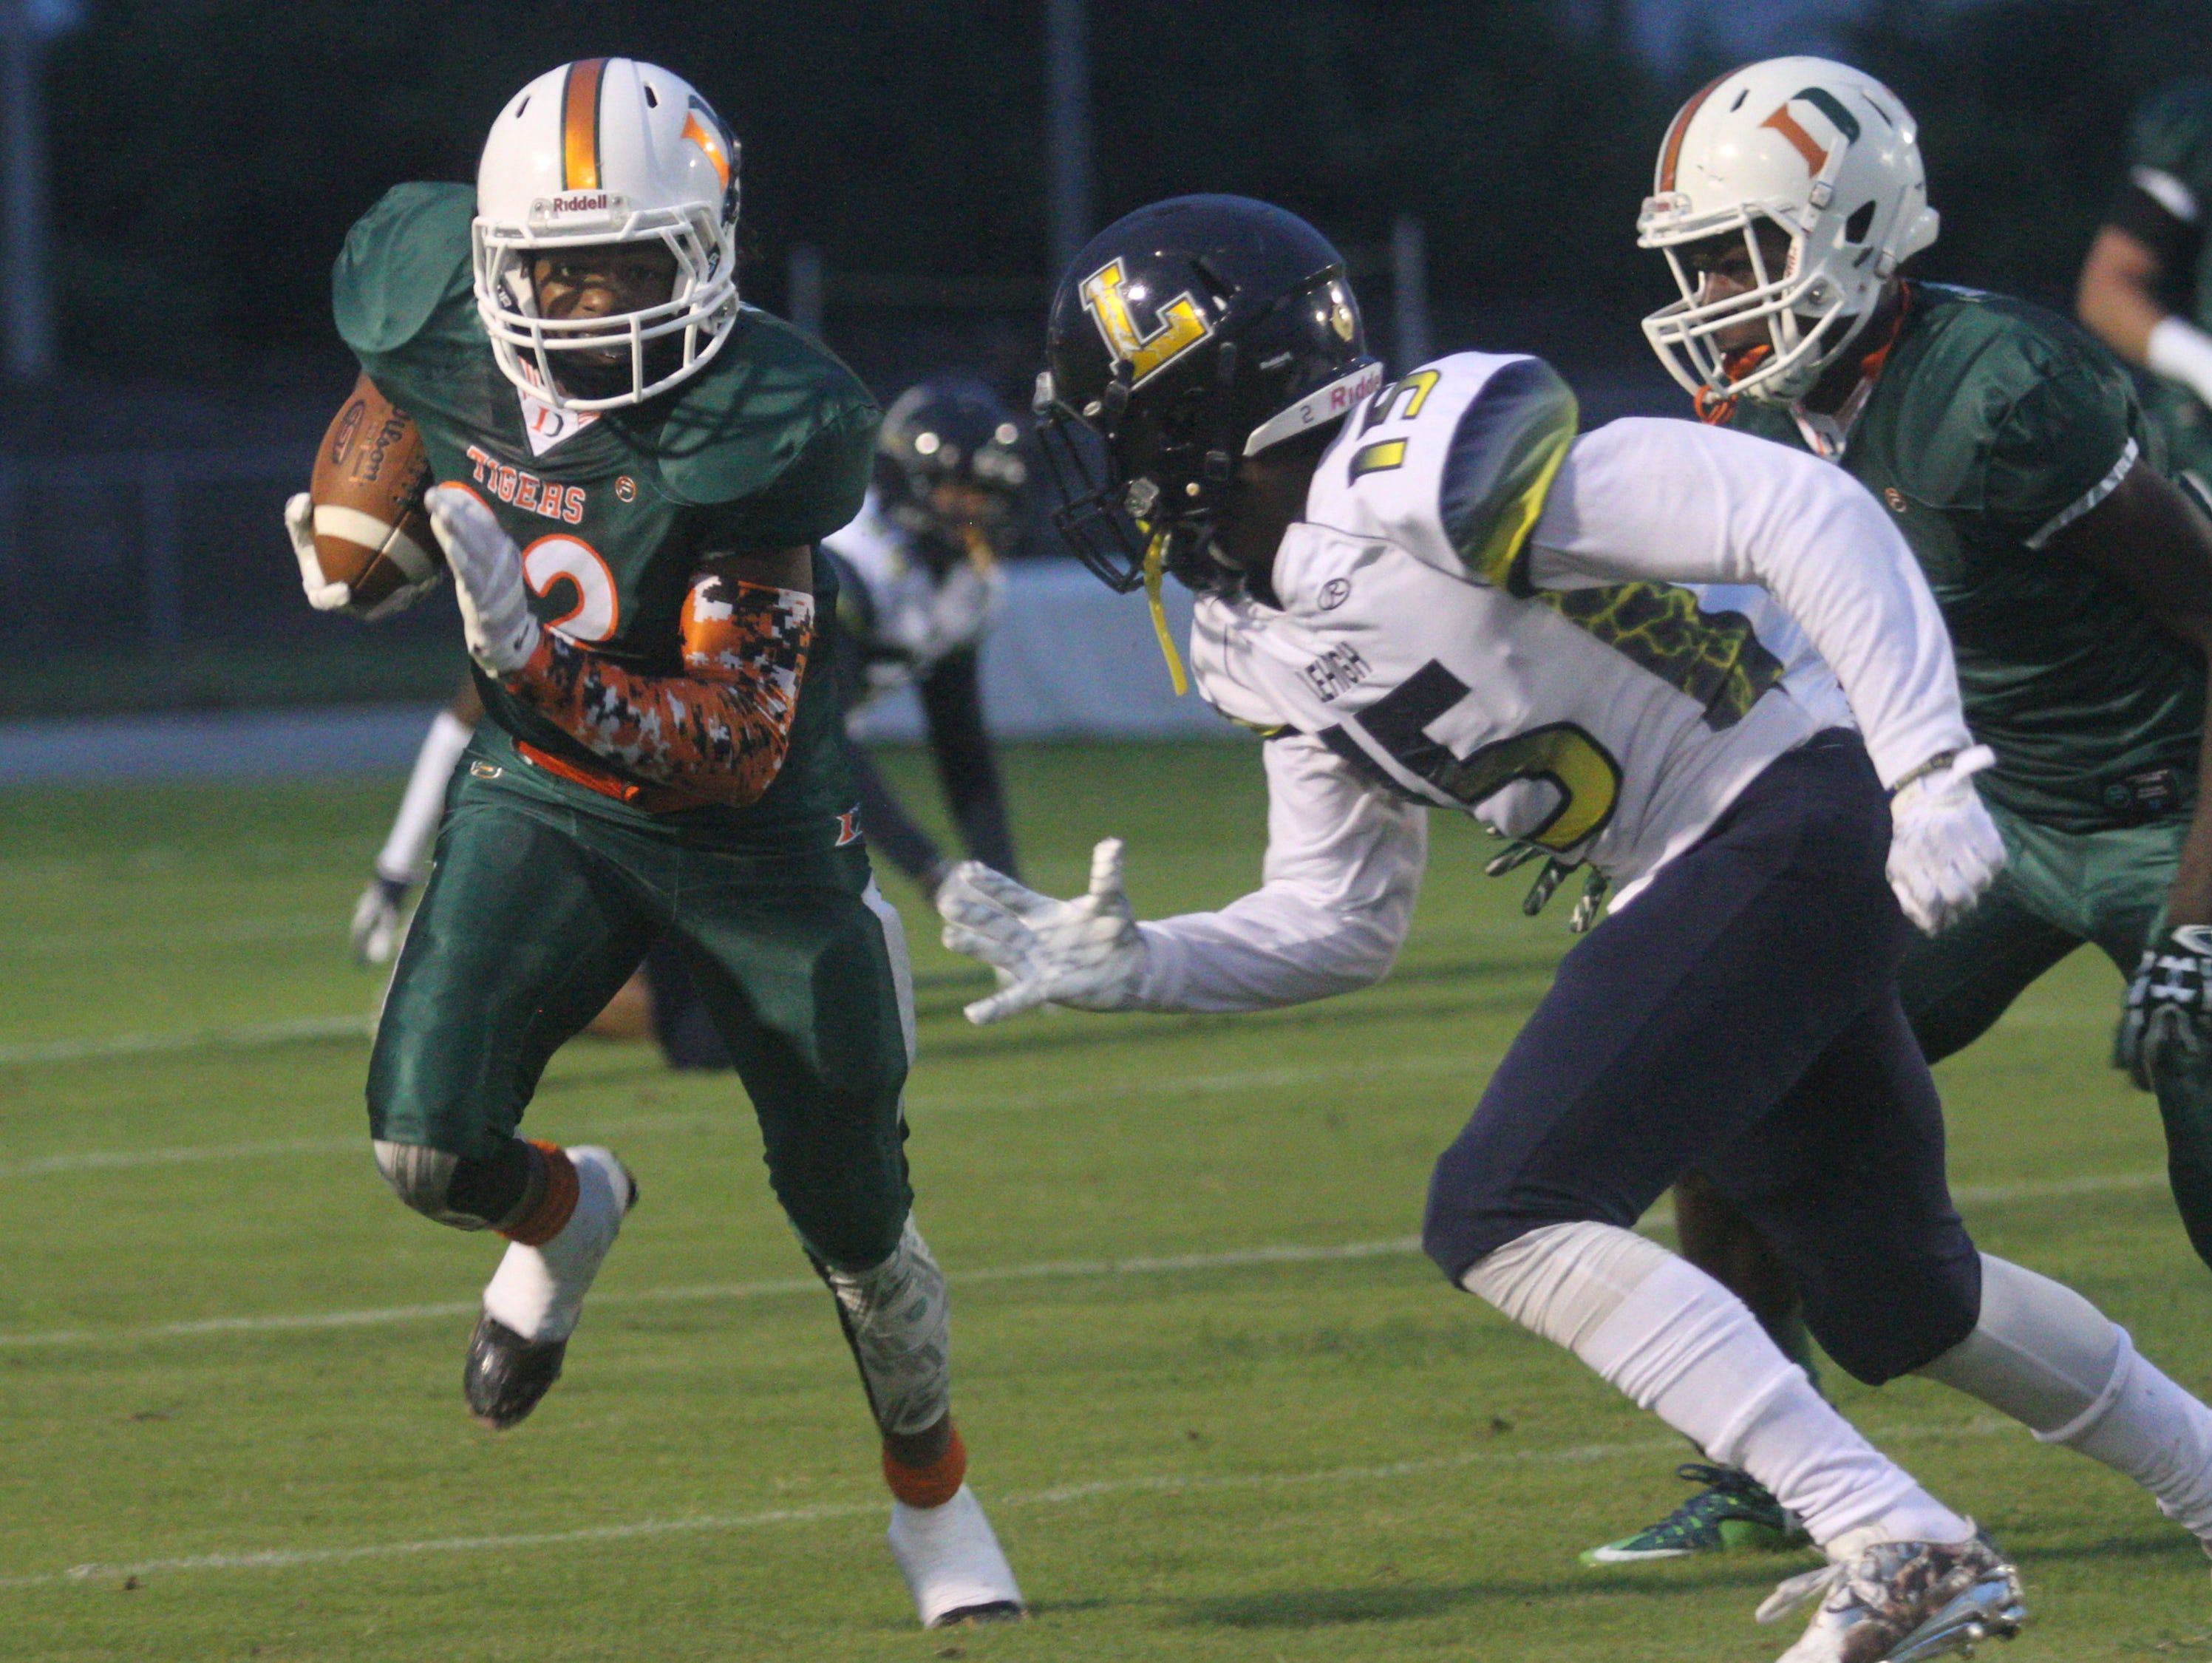 Dunbar takes on Lehigh in a high school football matchup on Friday night at Dunbar High School.